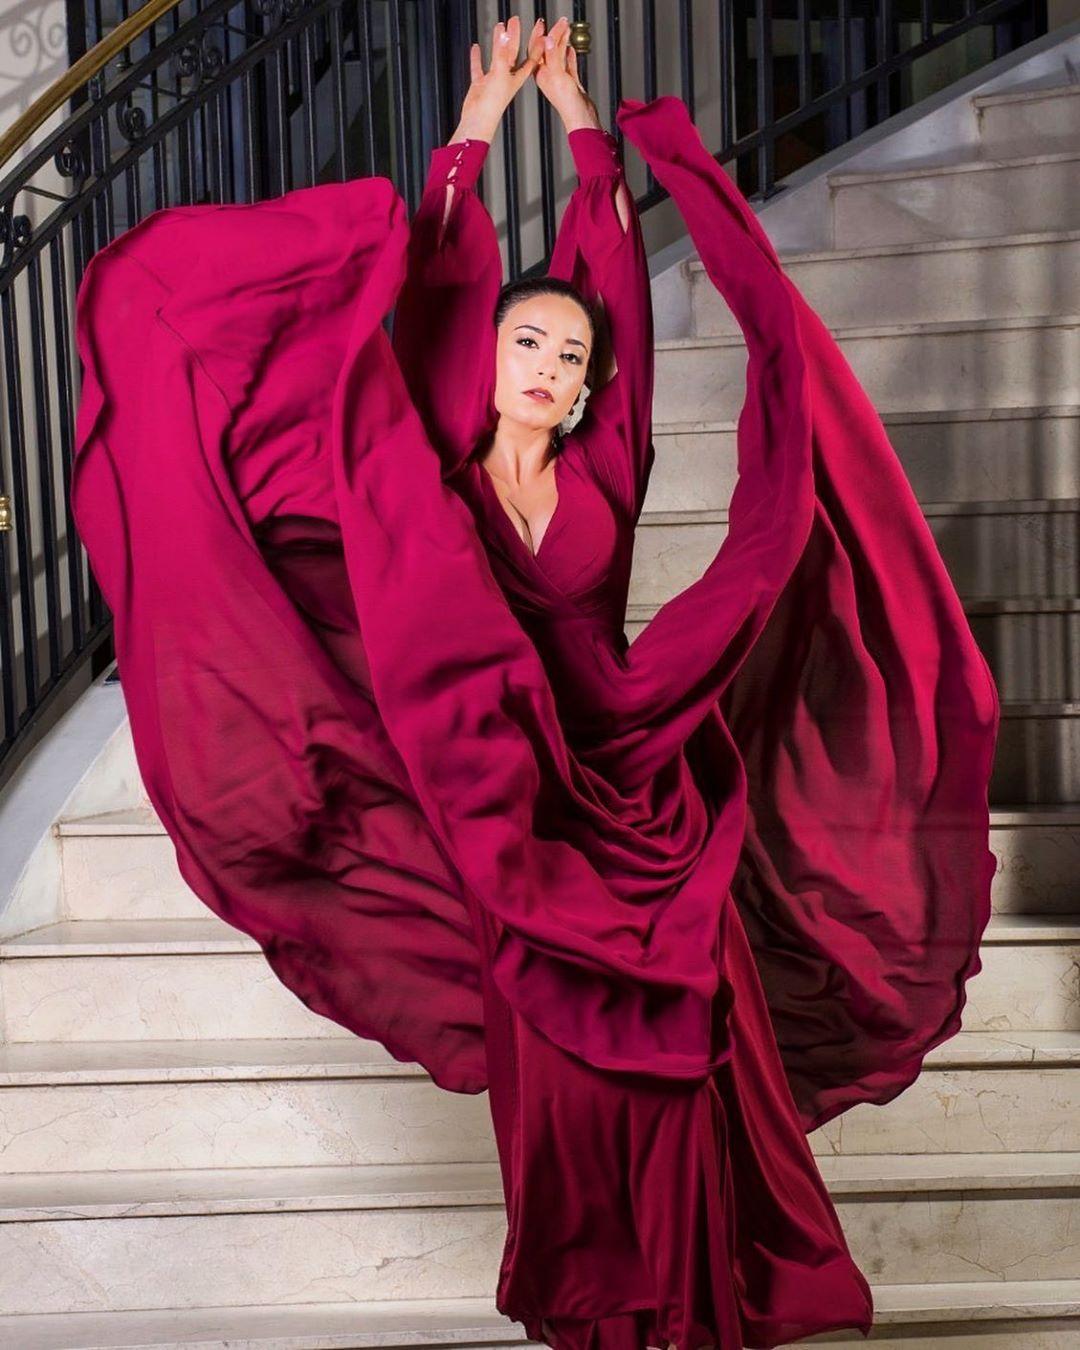 julia gama, miss brasil universo 2020/top 11 de miss world 2014. - Página 3 97203310